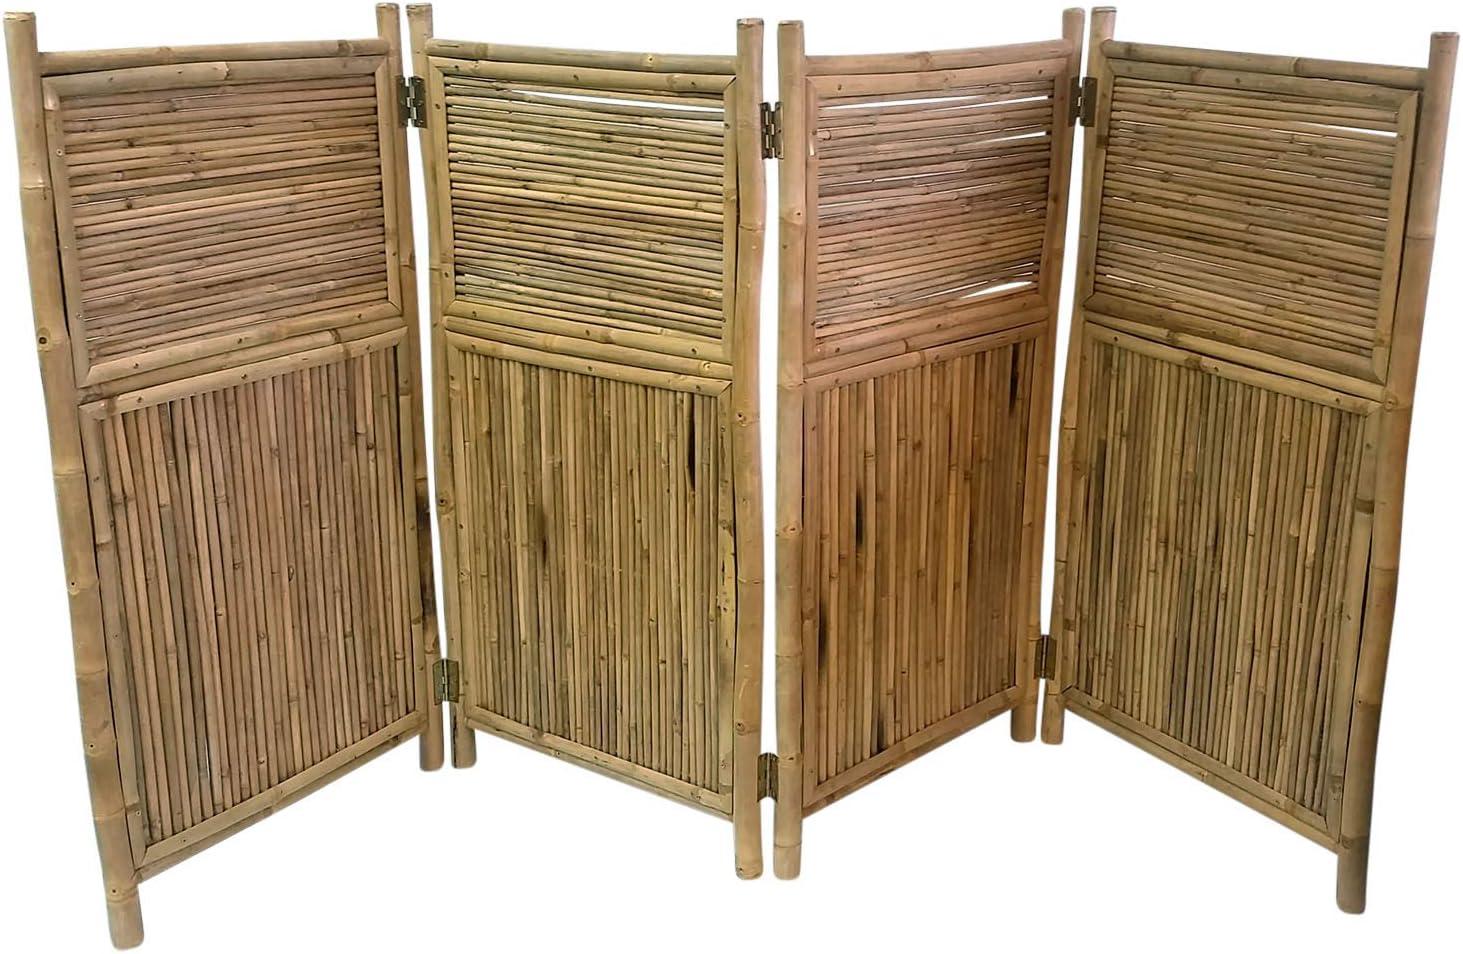 MGP Four Panel Bamboo Screen Enclosure 48